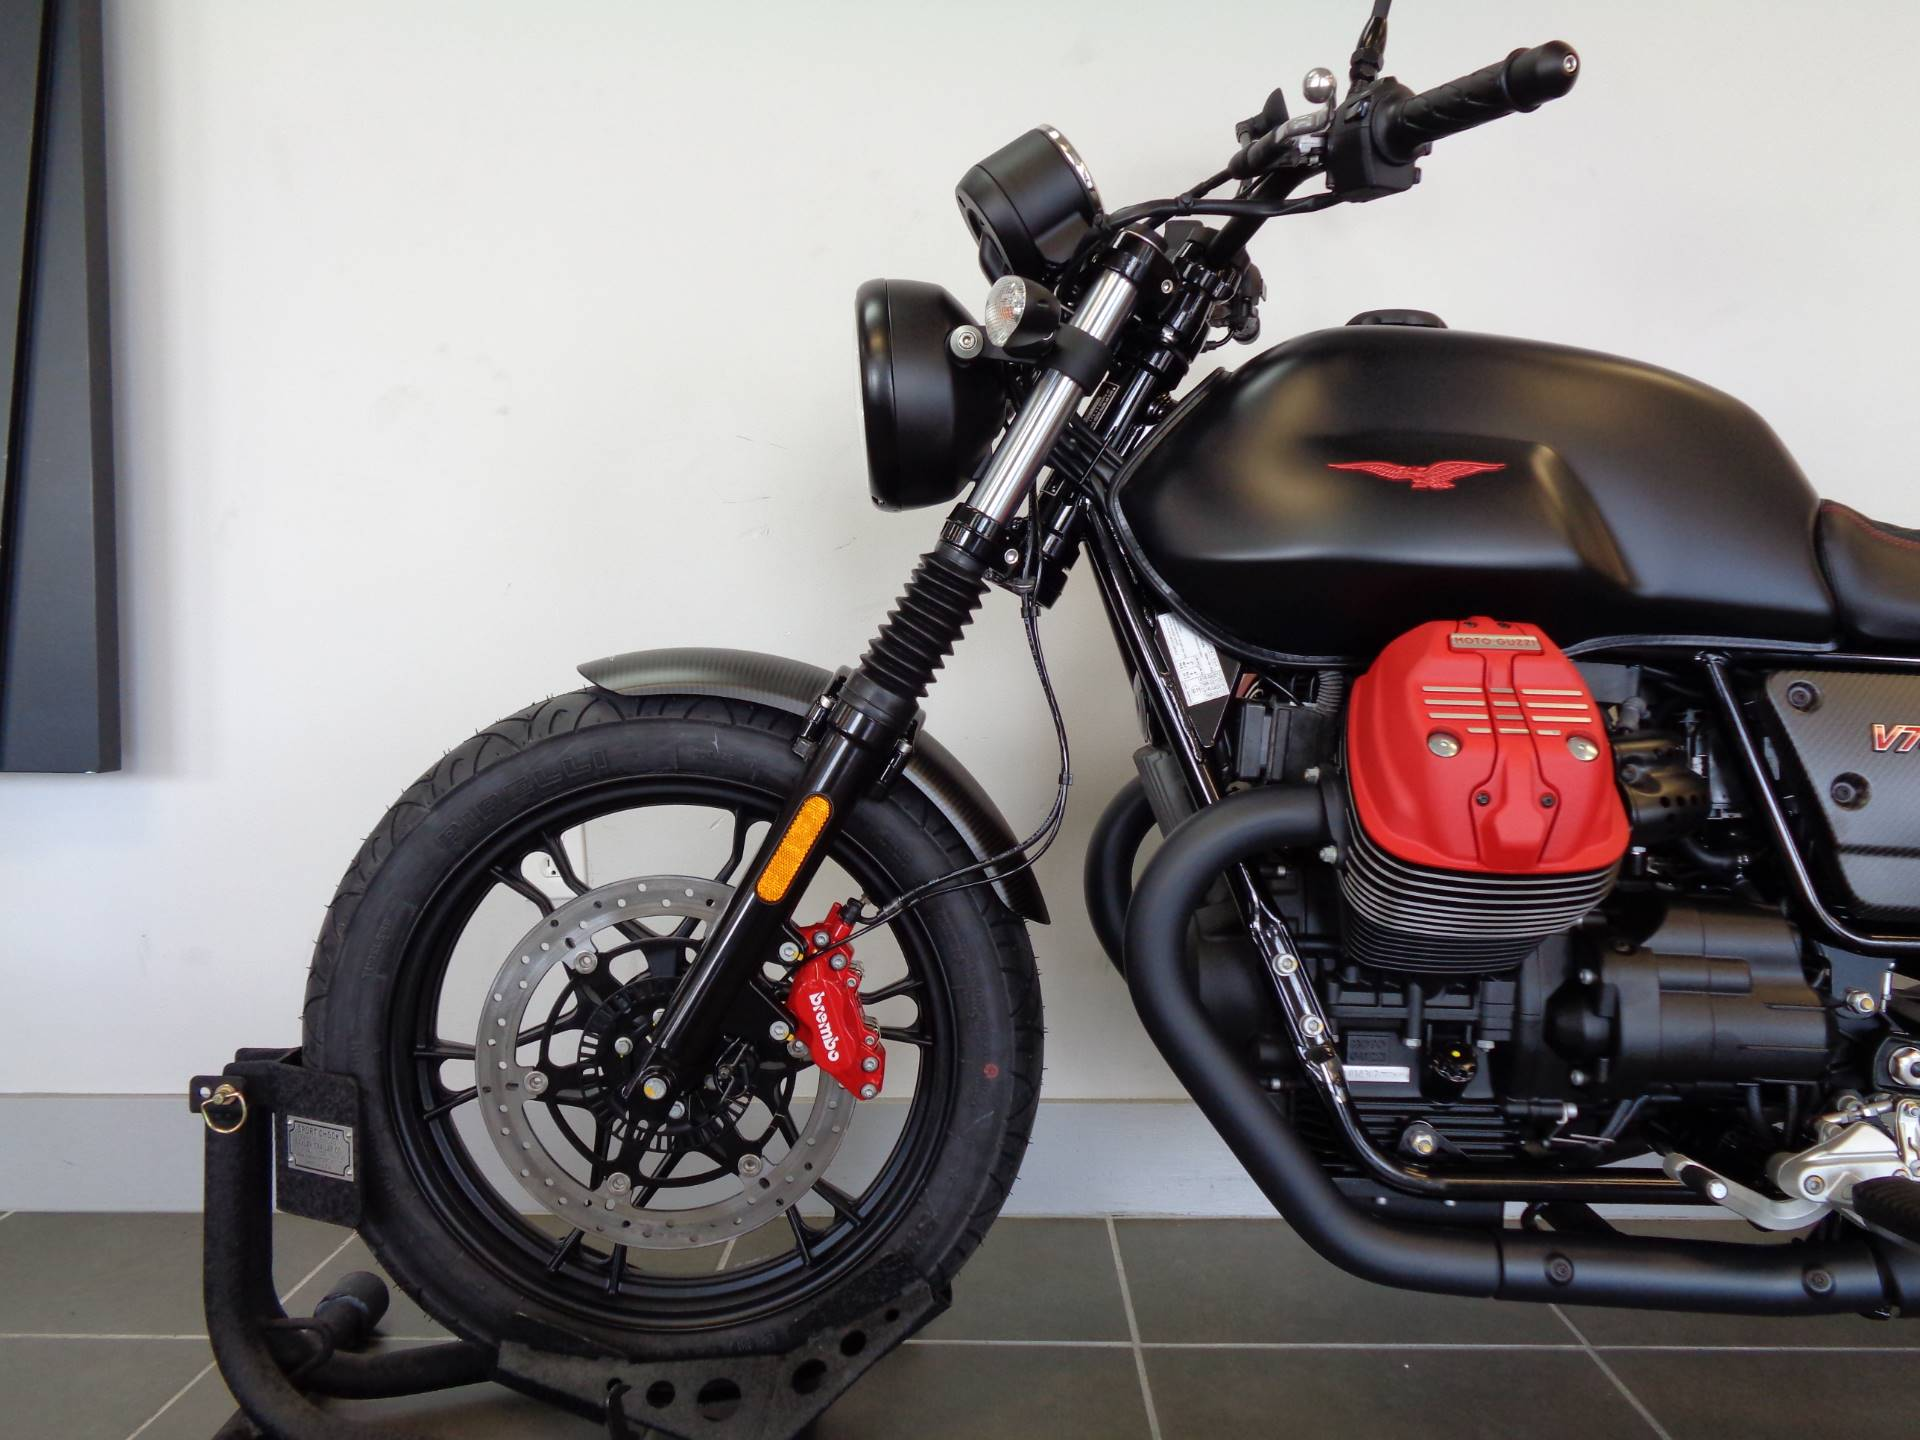 2018 Moto Guzzi V7 III Carbon Dark 12